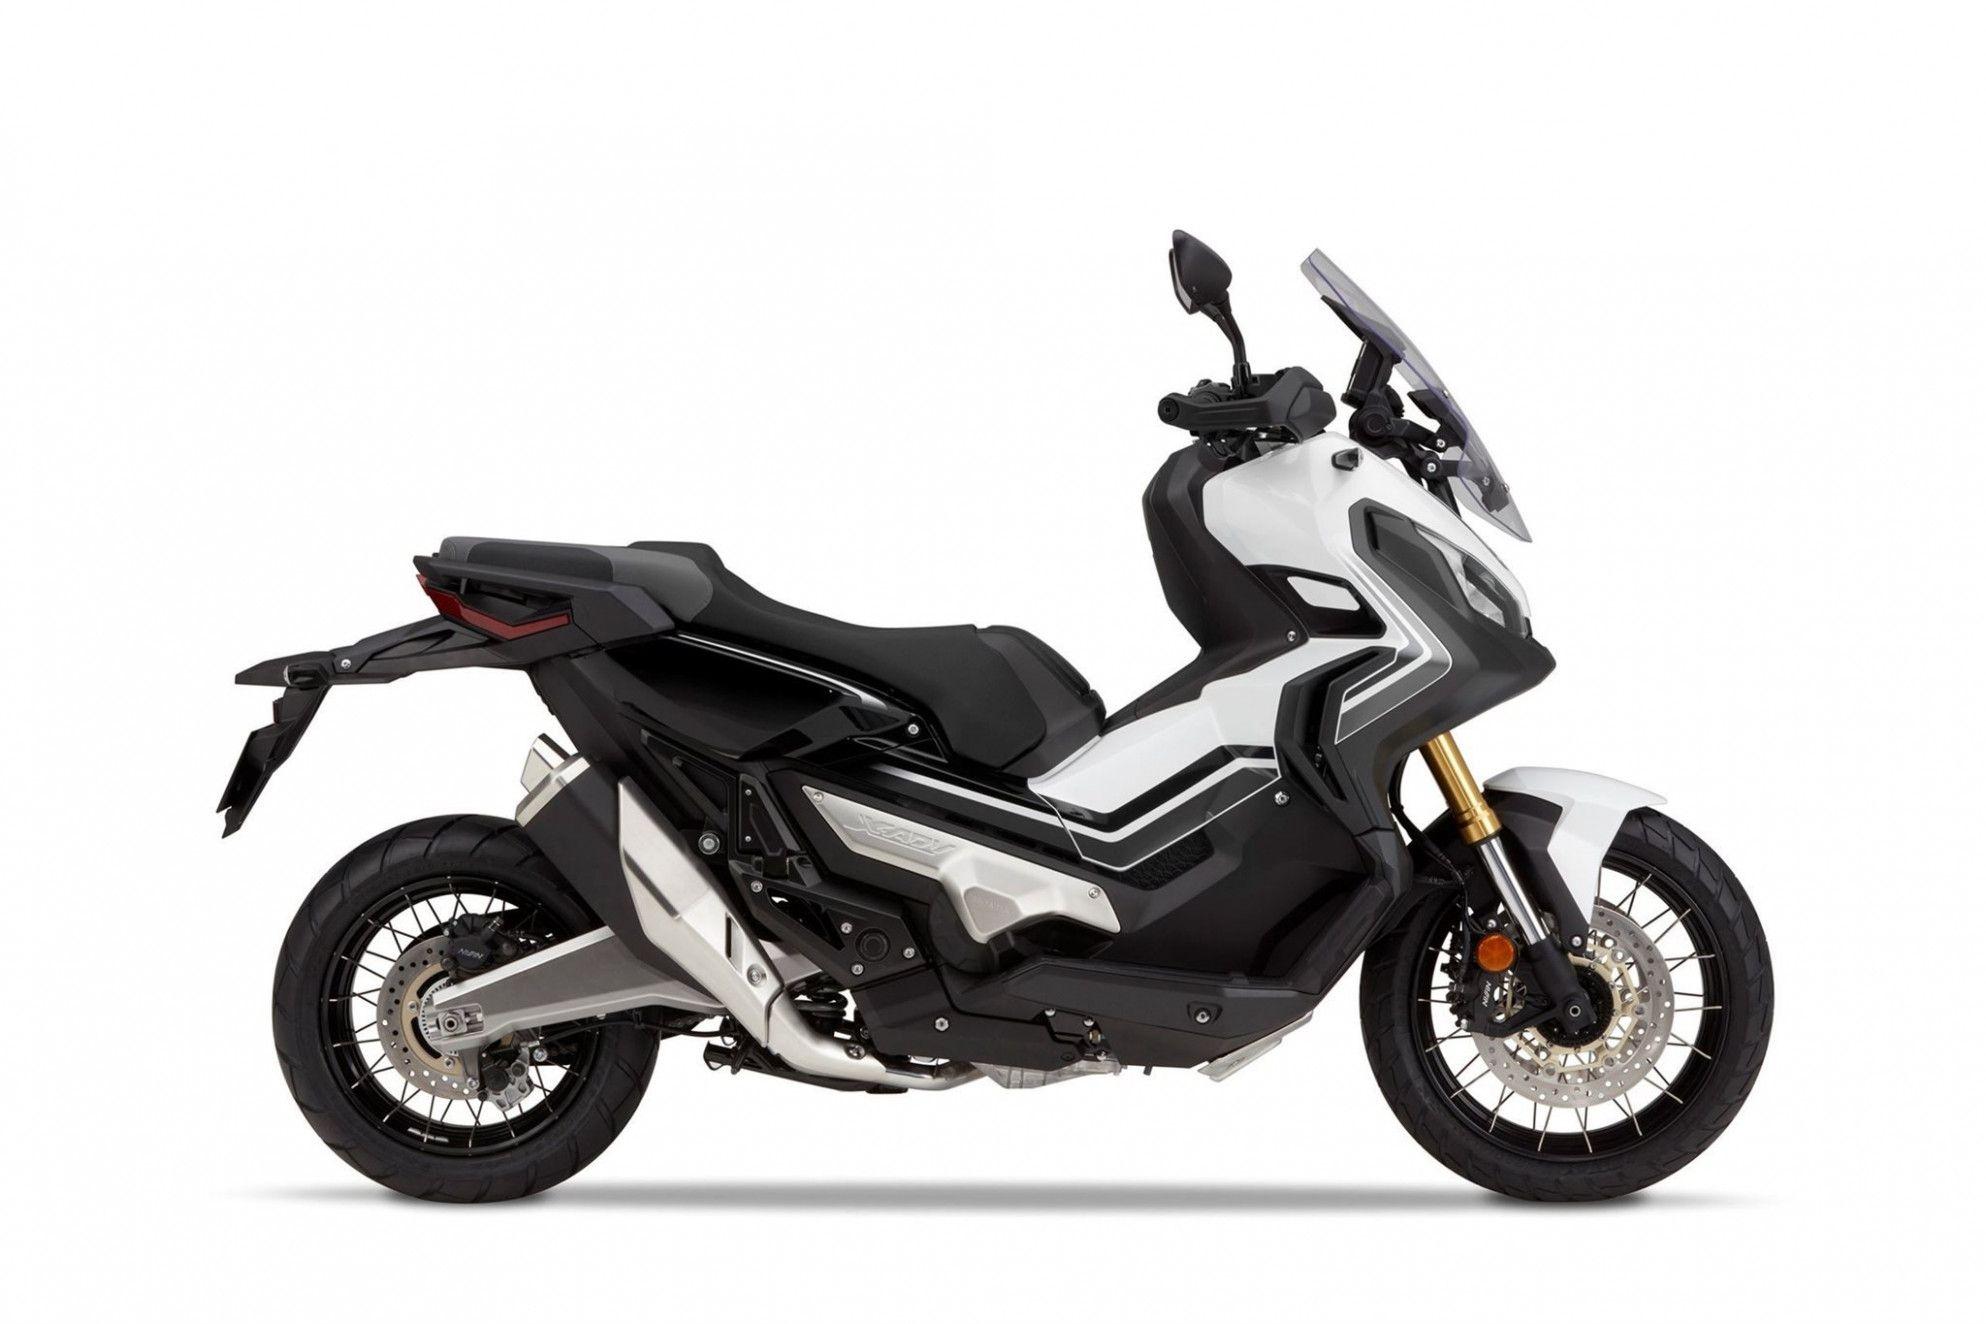 Honda X Adv 2021 Specs And Review In 2020 Motorcycle Honda Motos